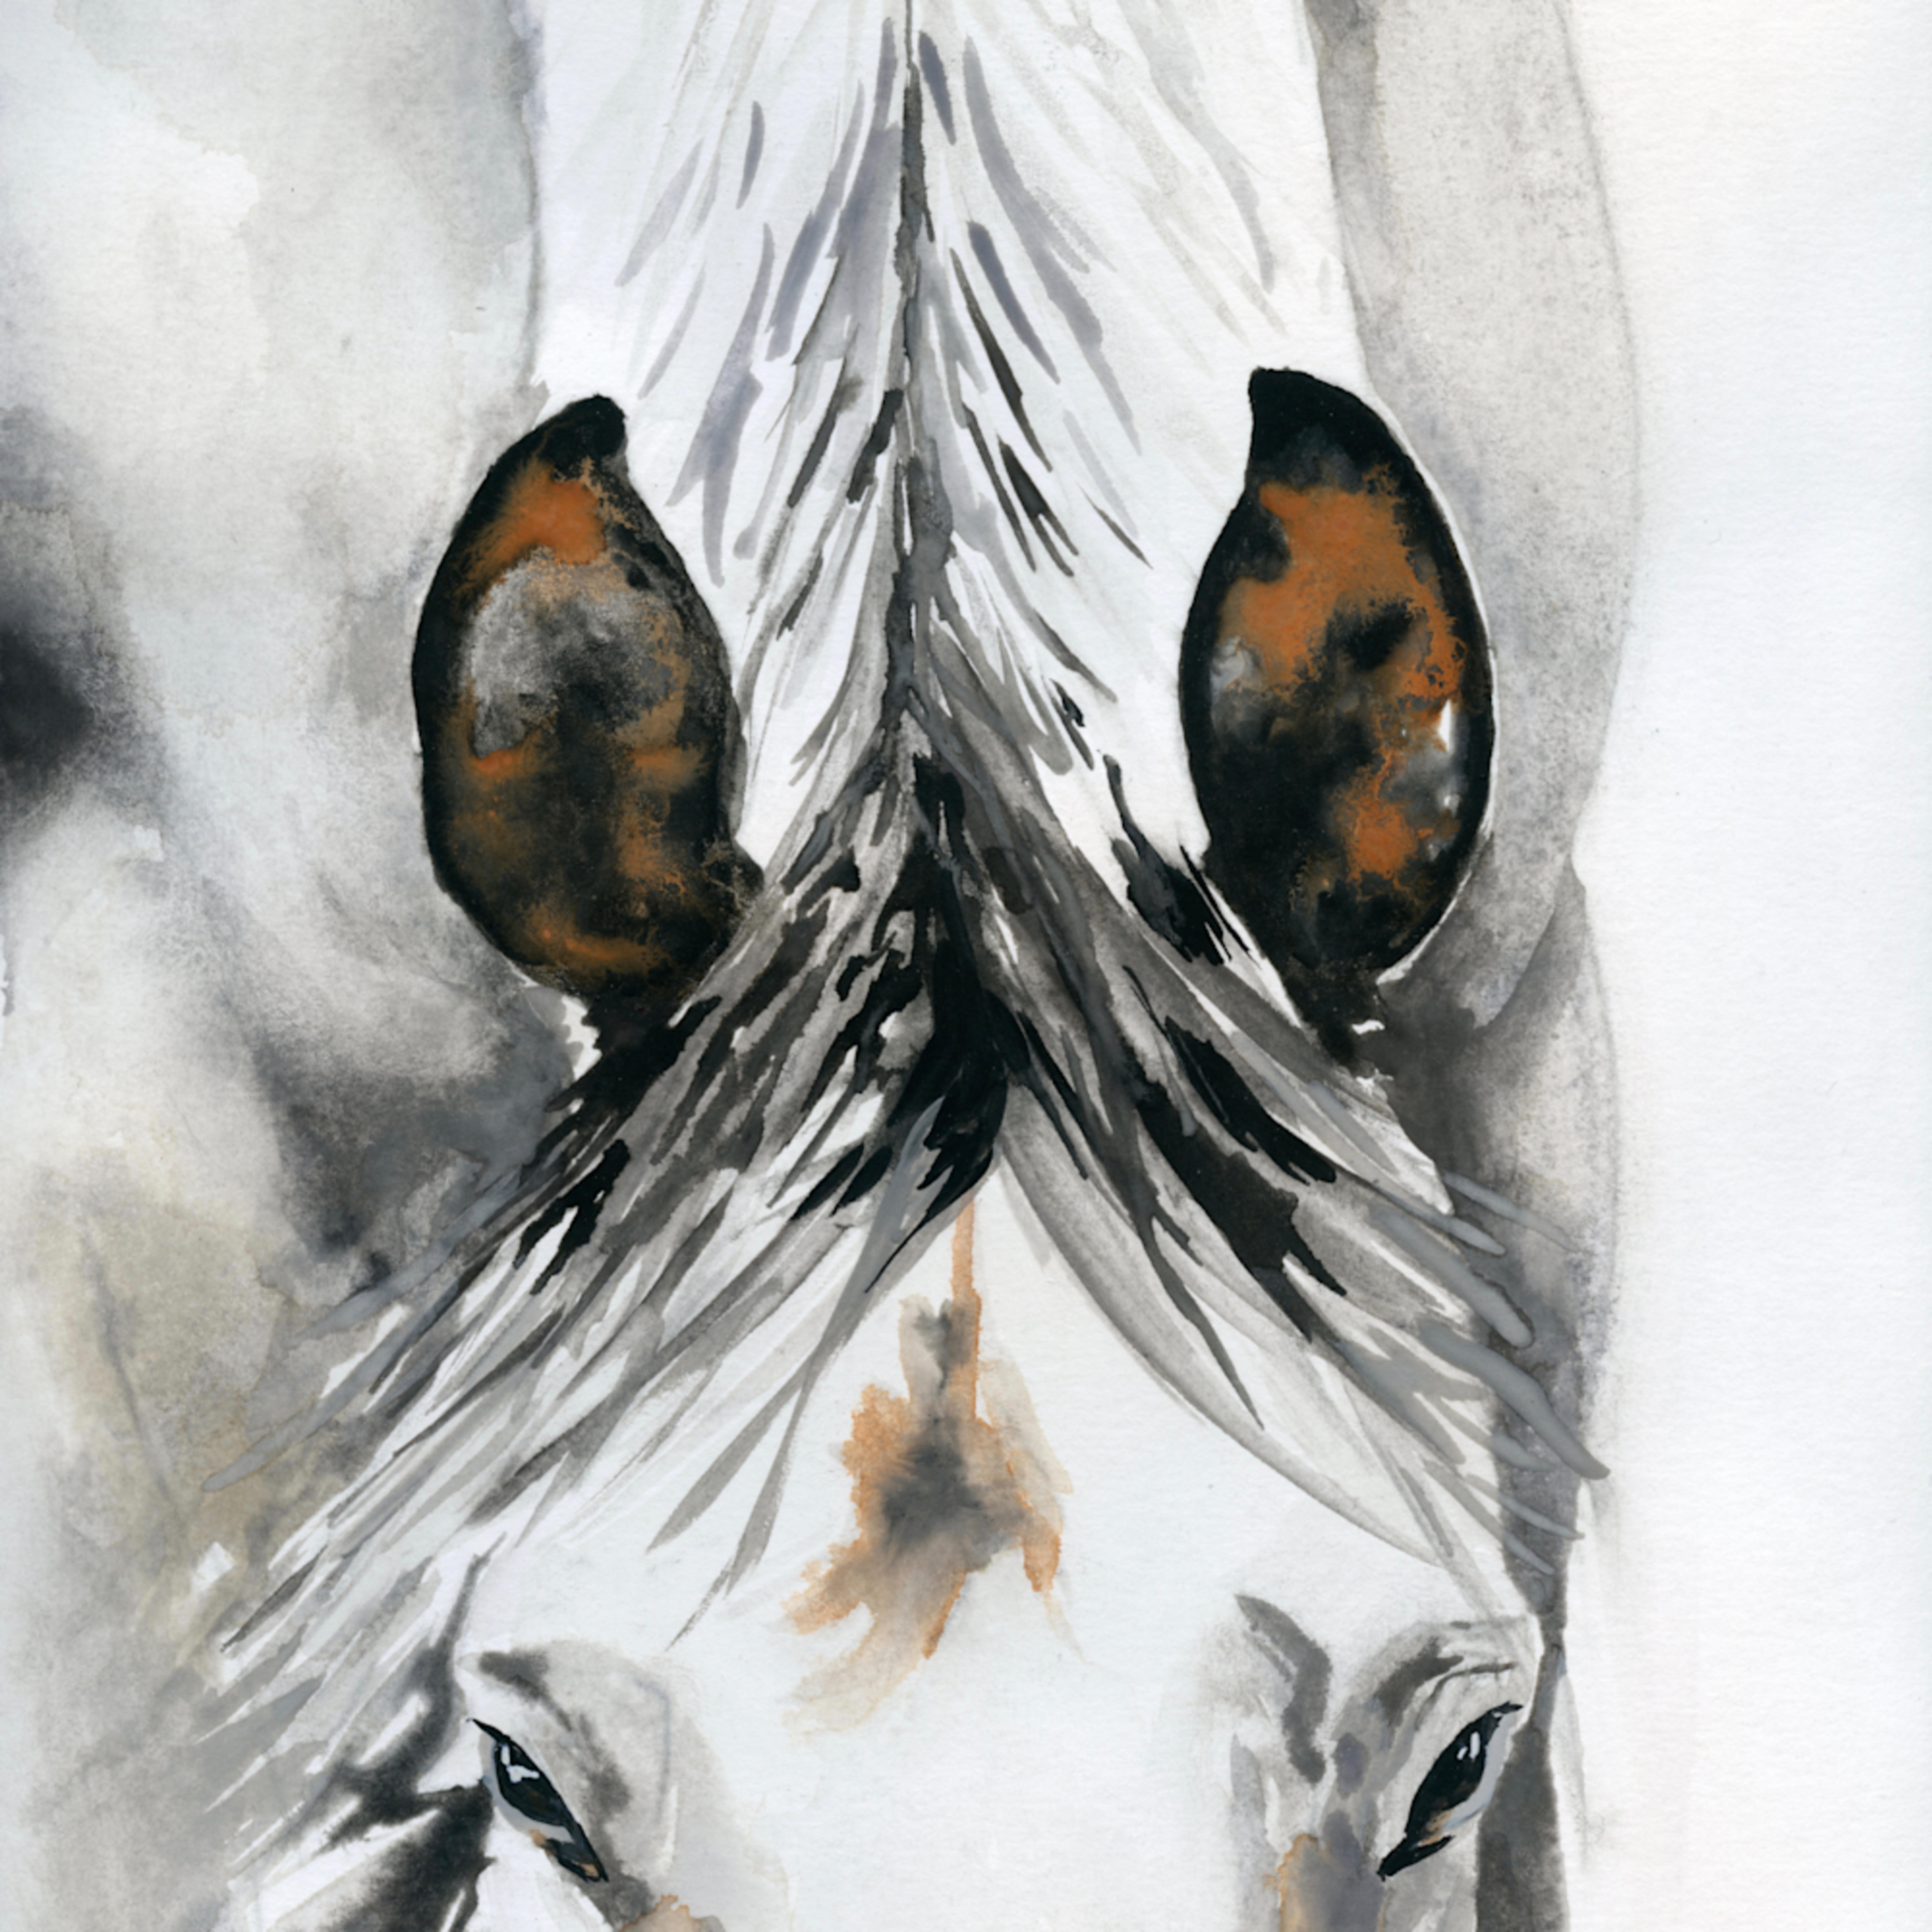 Large  white horse nose down 9x12 xodjl7